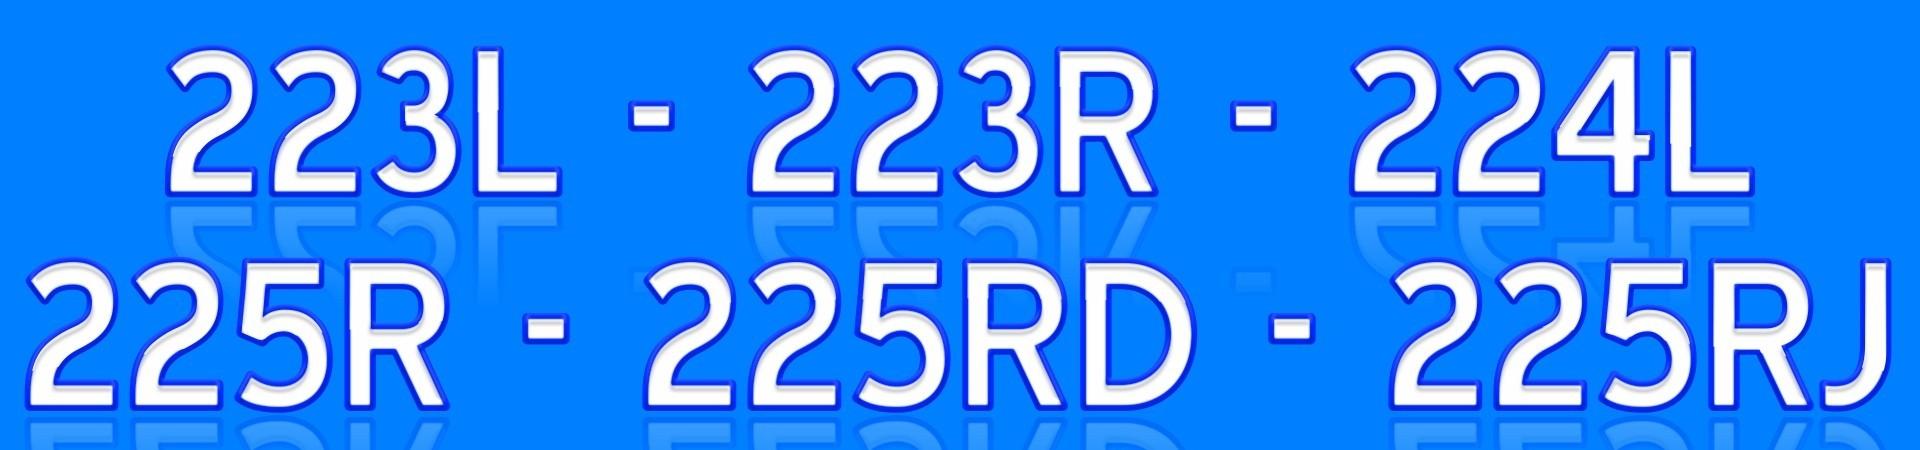 REPUESTOS para Desbrozadora HUSQVARNA 225R 227R 232R 235R